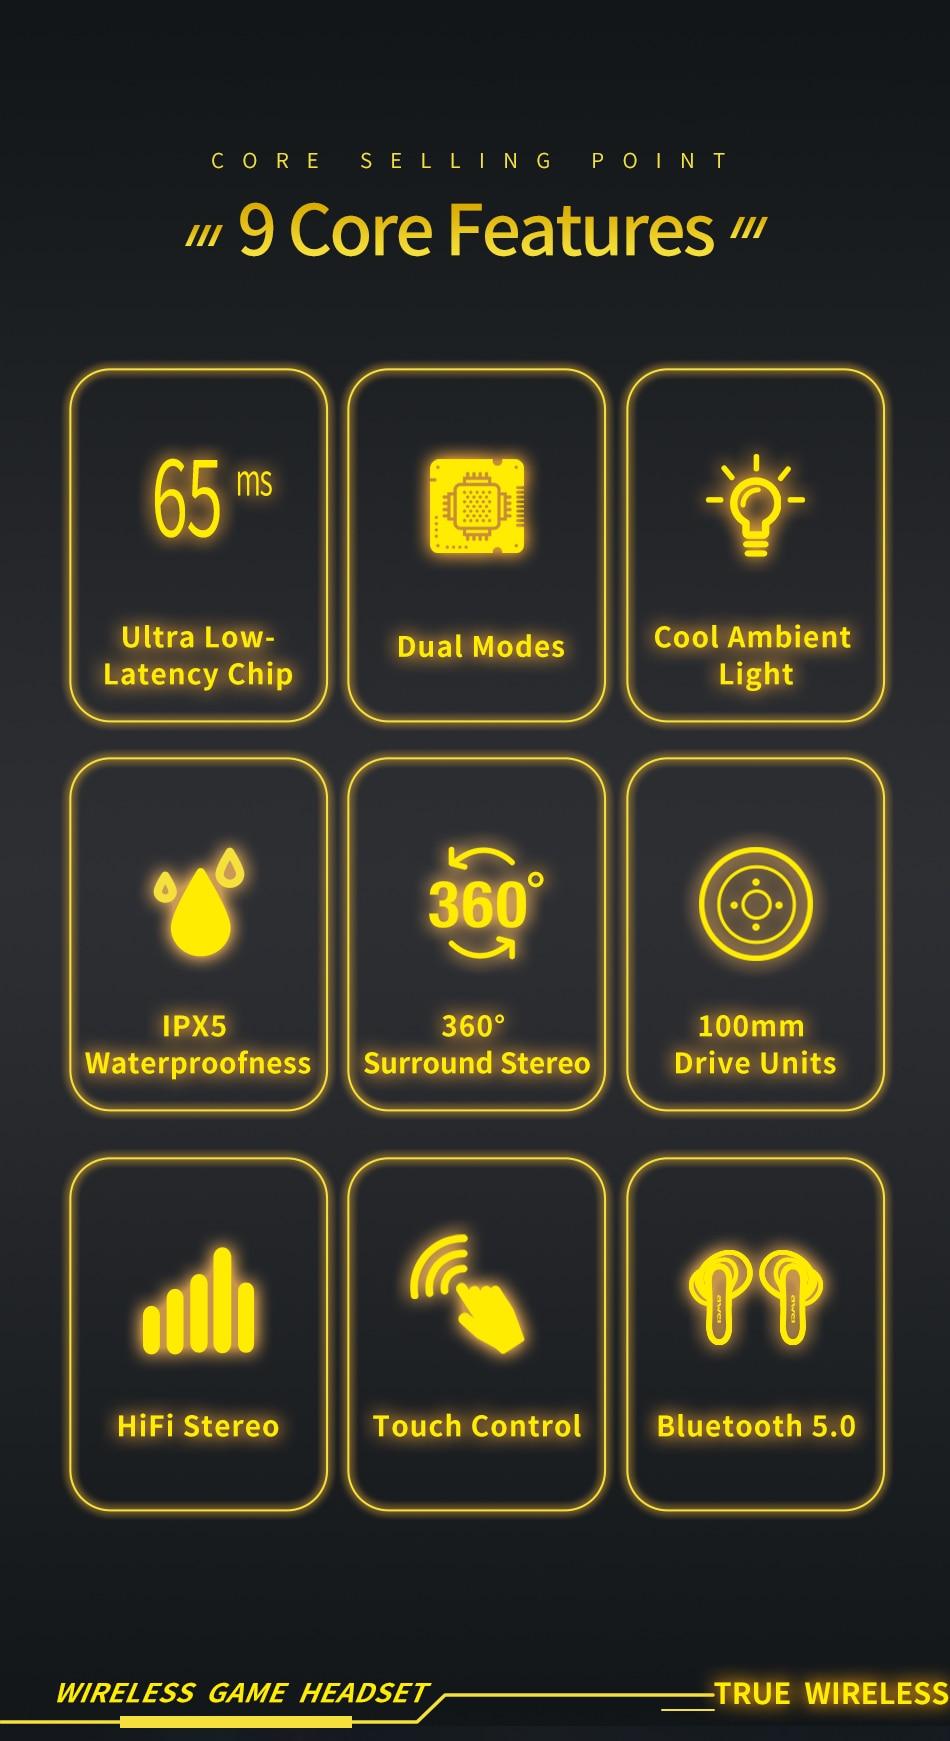 Gaming Earbuds 360° με Smart Touch In Ear - Ασύρματα Bluetooth Ακουστικά Handsfree IPX5 Μαύρο